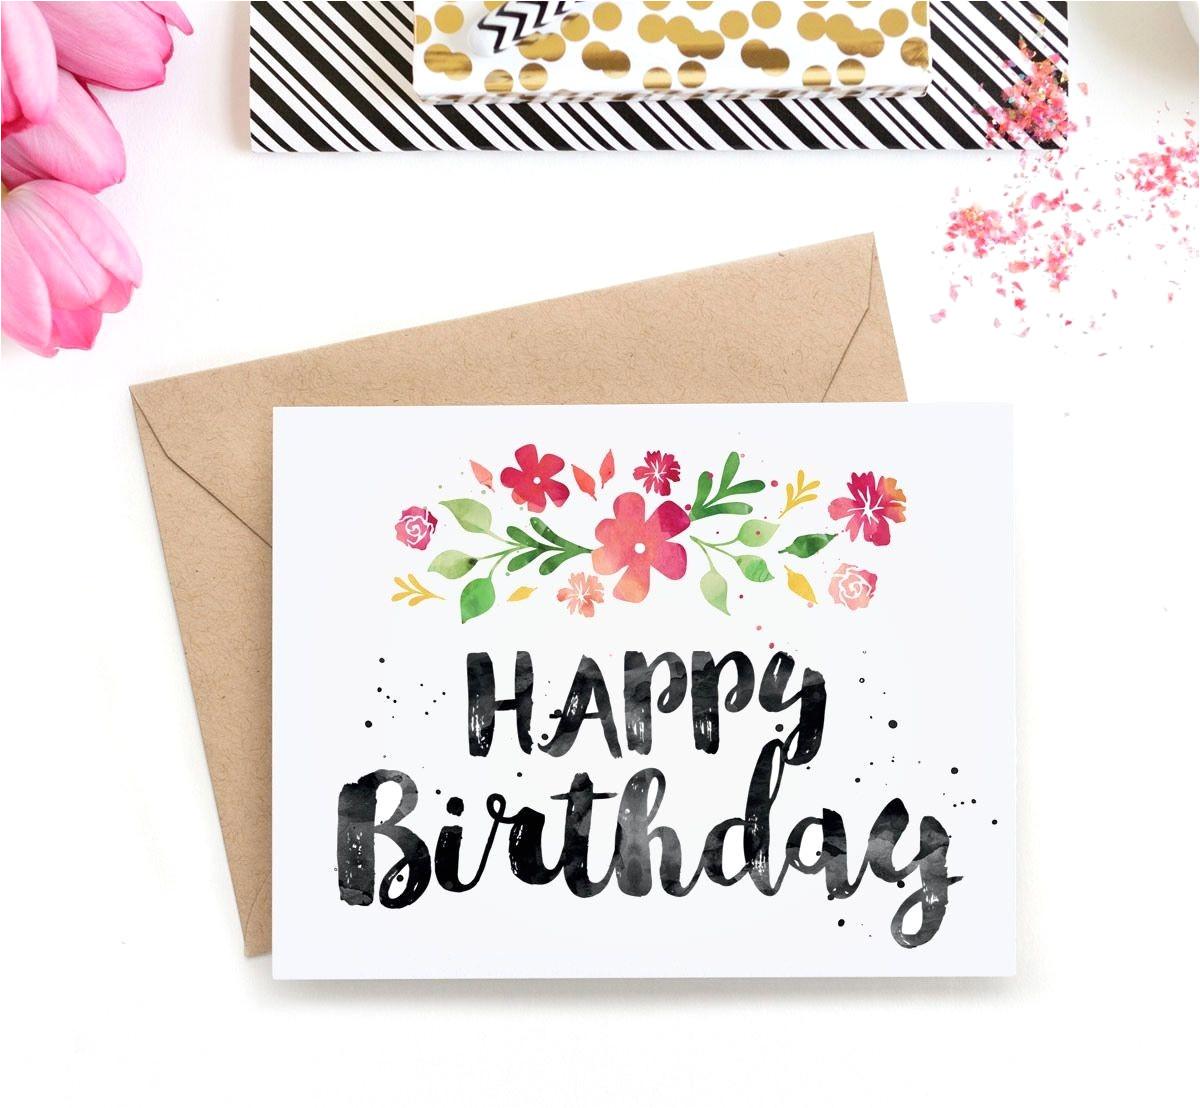 free geburtstagskarten luxus birthday cards nyc luxury 25th birthday cards for boyfriend awesome of free geburtstagskarten jpg